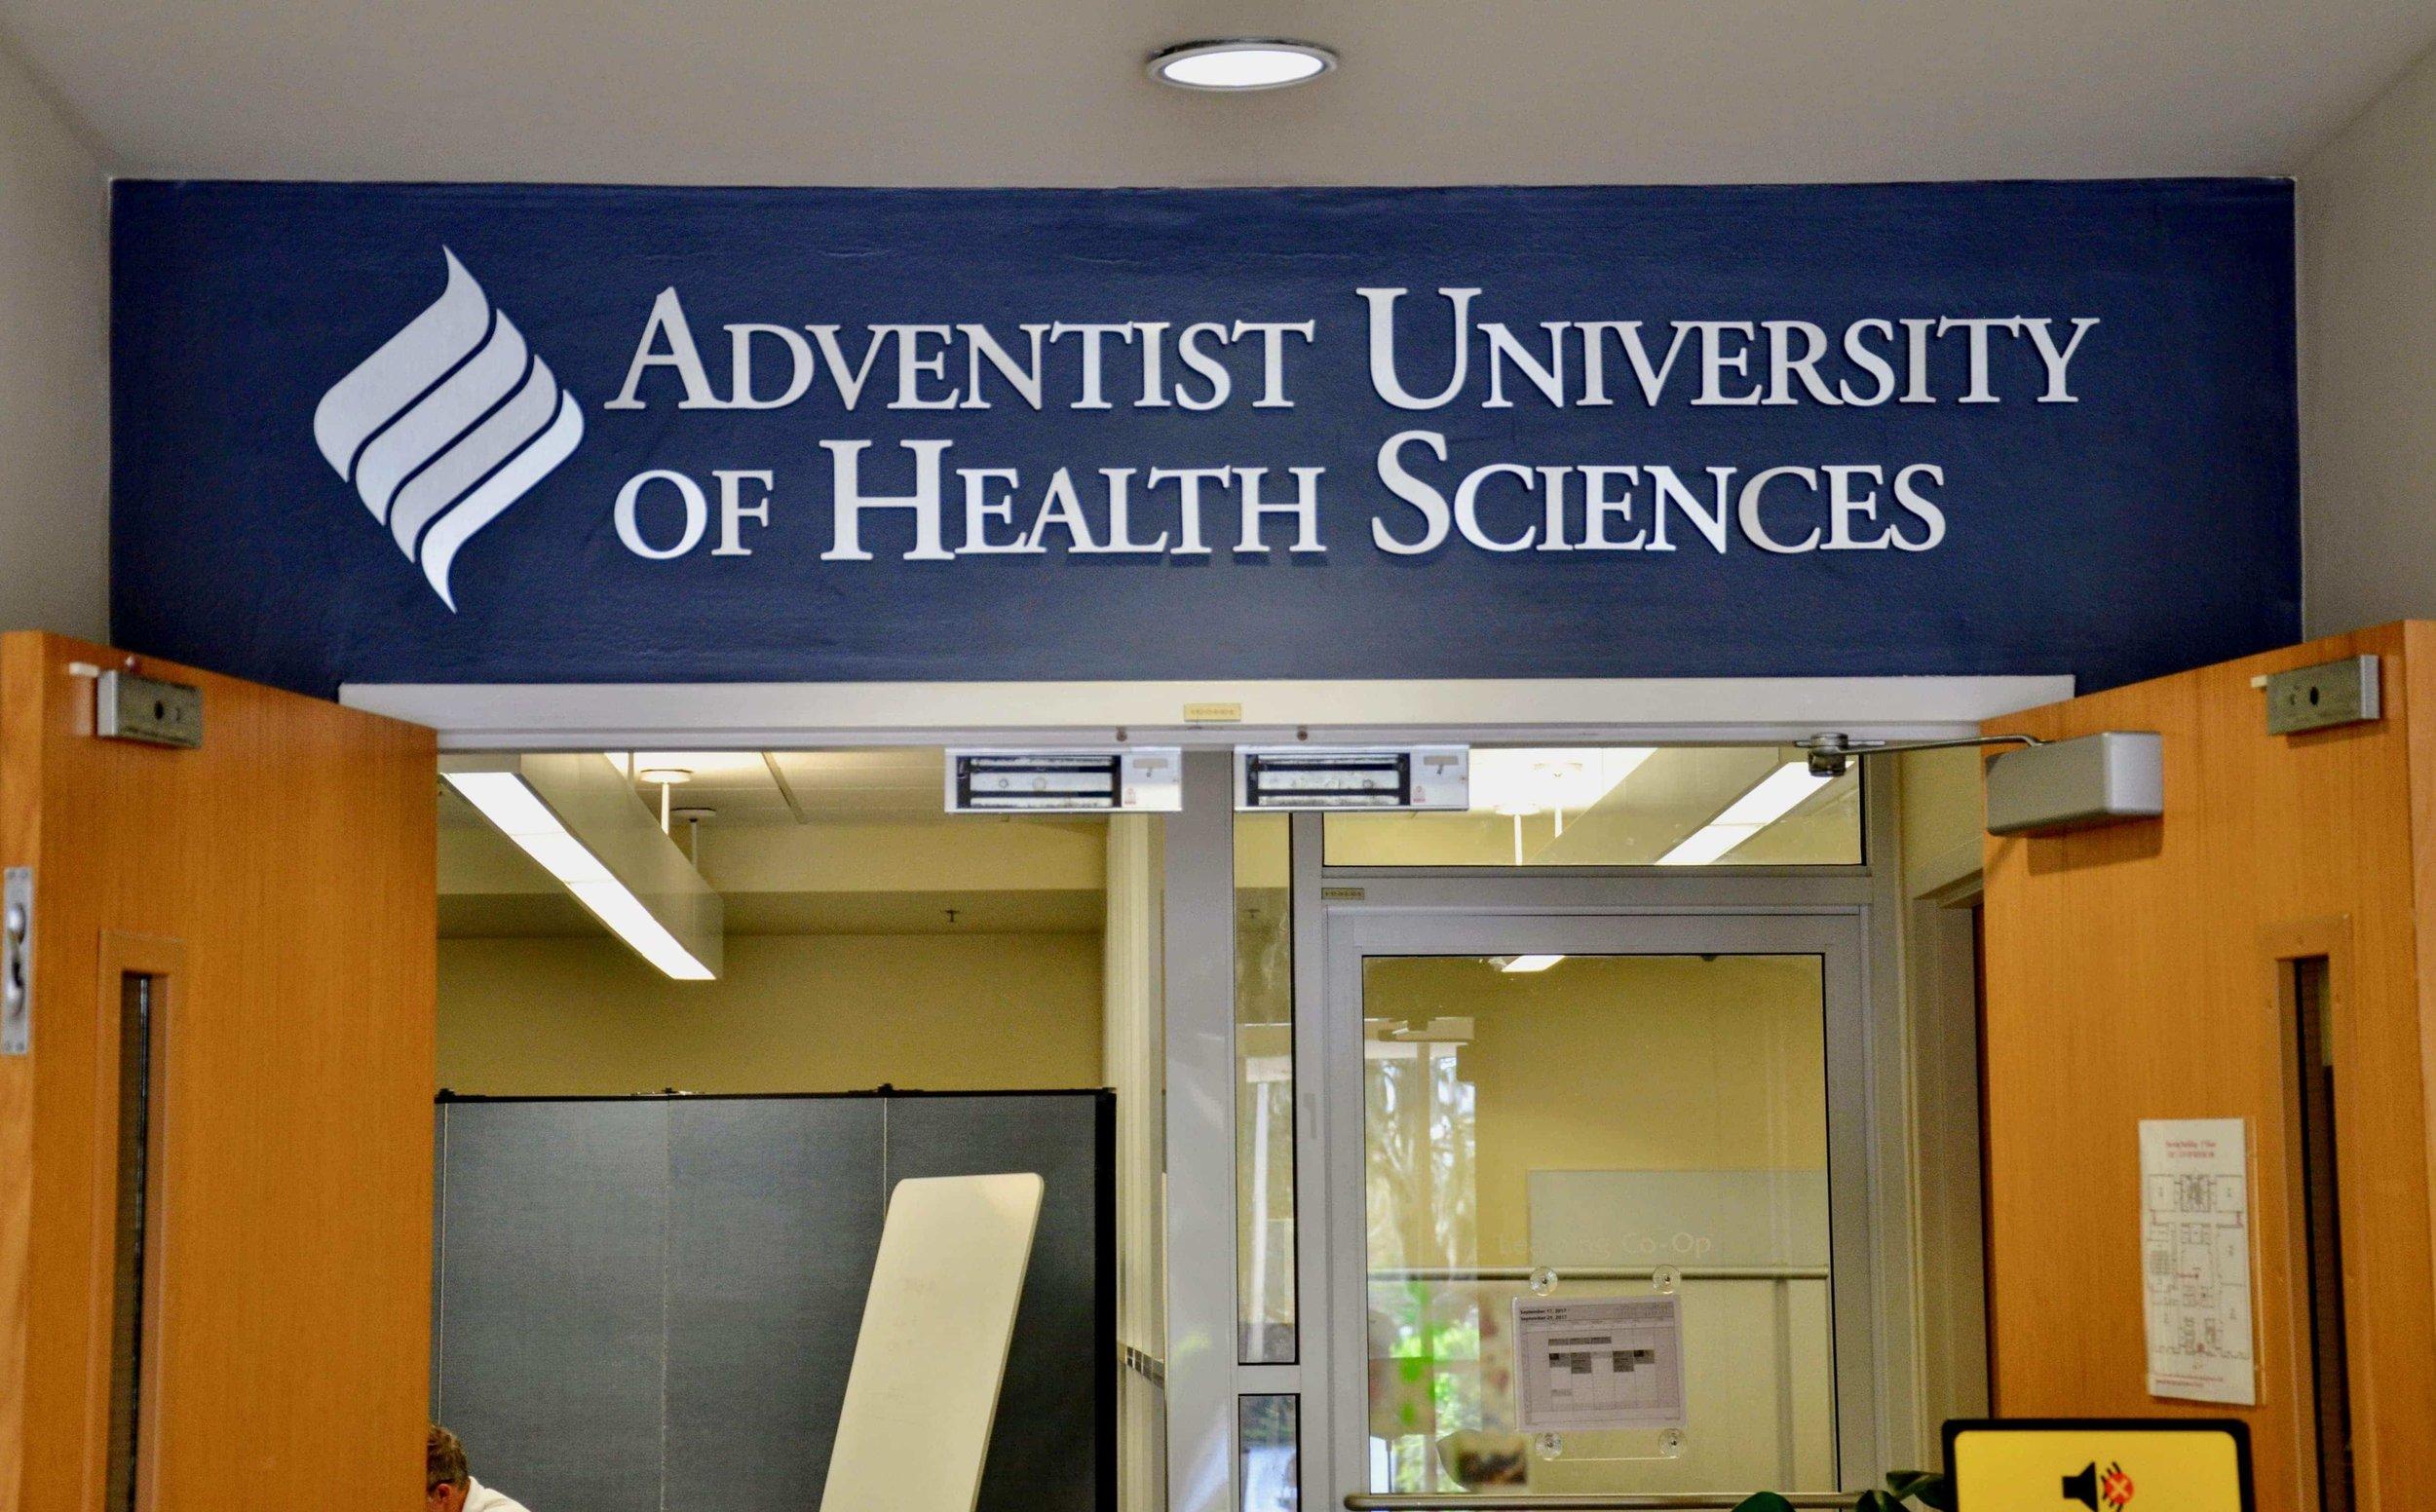 Adventist Signage and Installation -